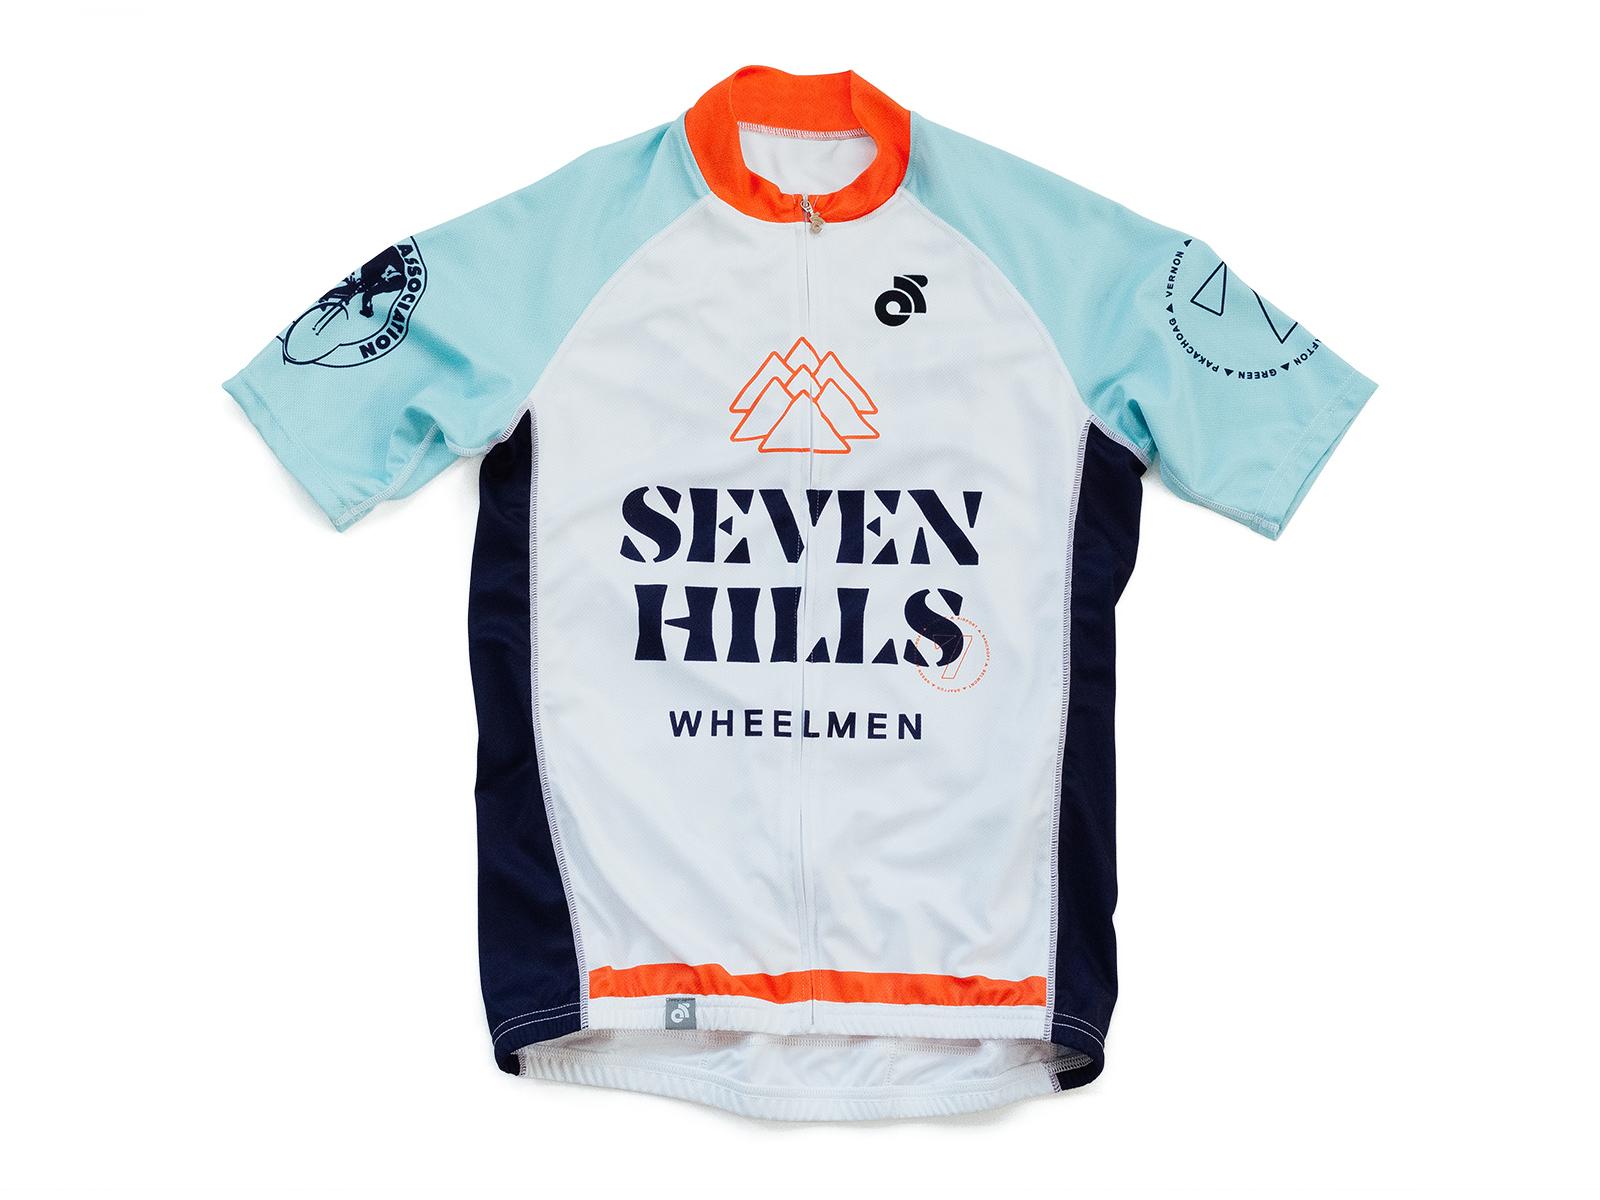 Personal-7HW-Jersey-Shirt-1600.jpg